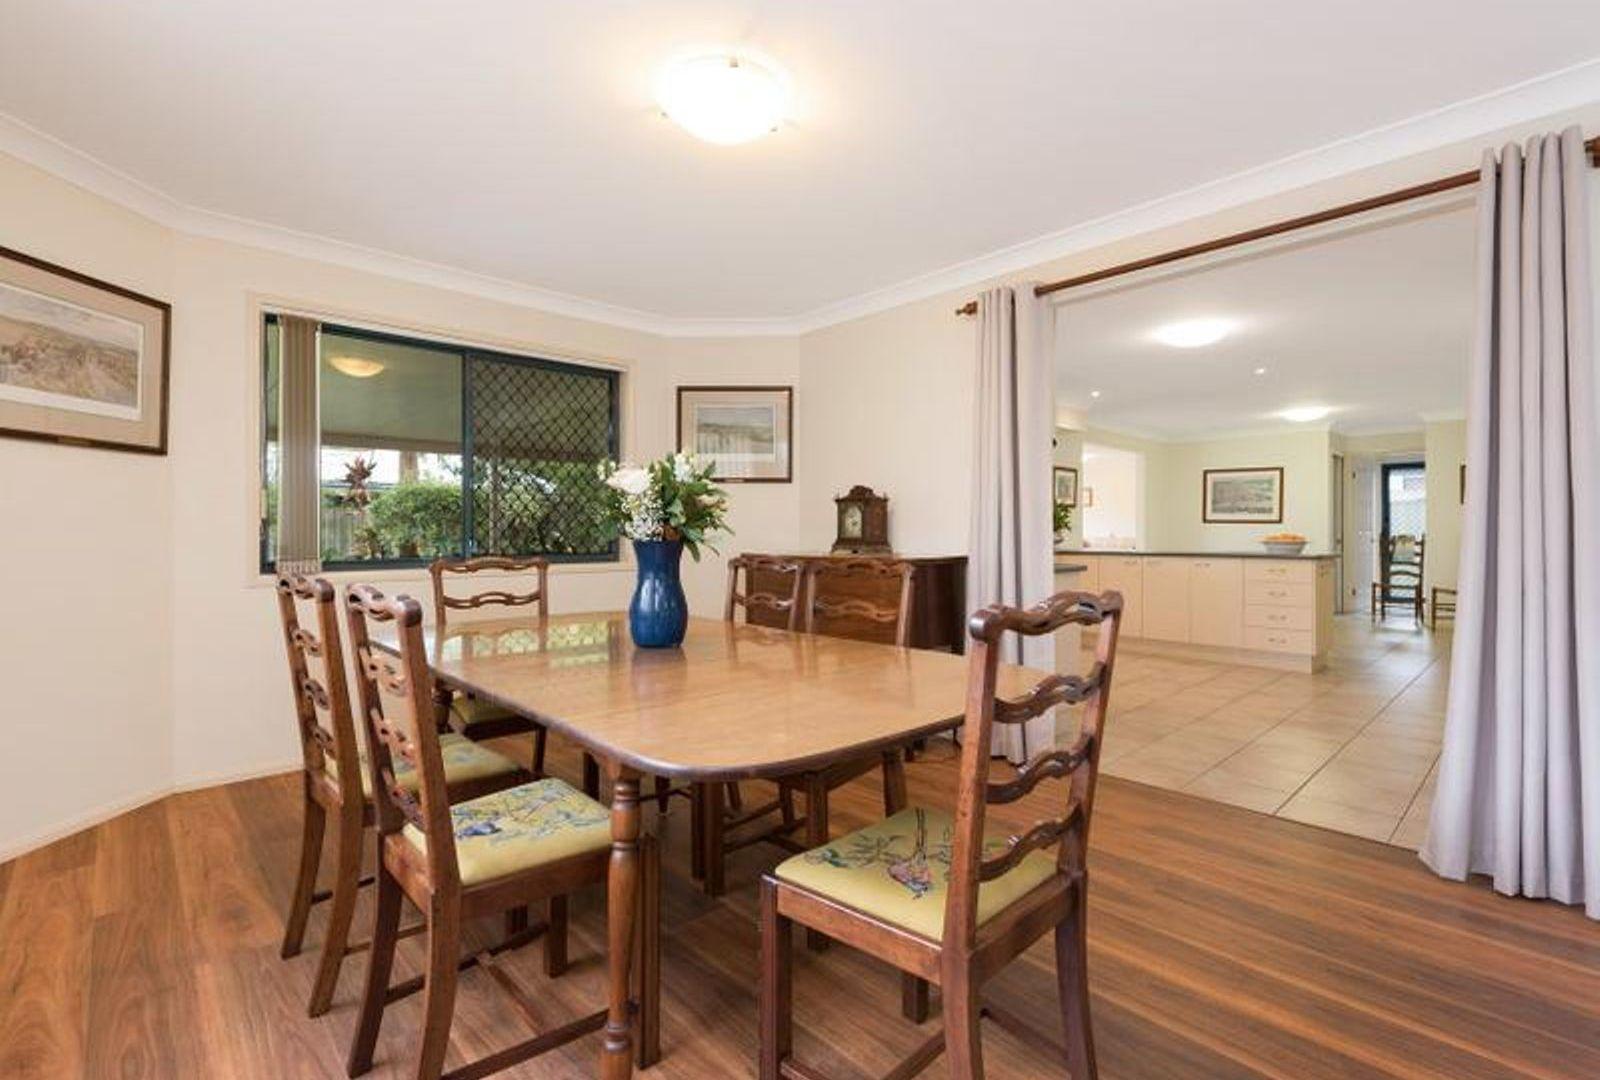 9 Barklya Crescent, Sinnamon Park QLD 4073, Image 2